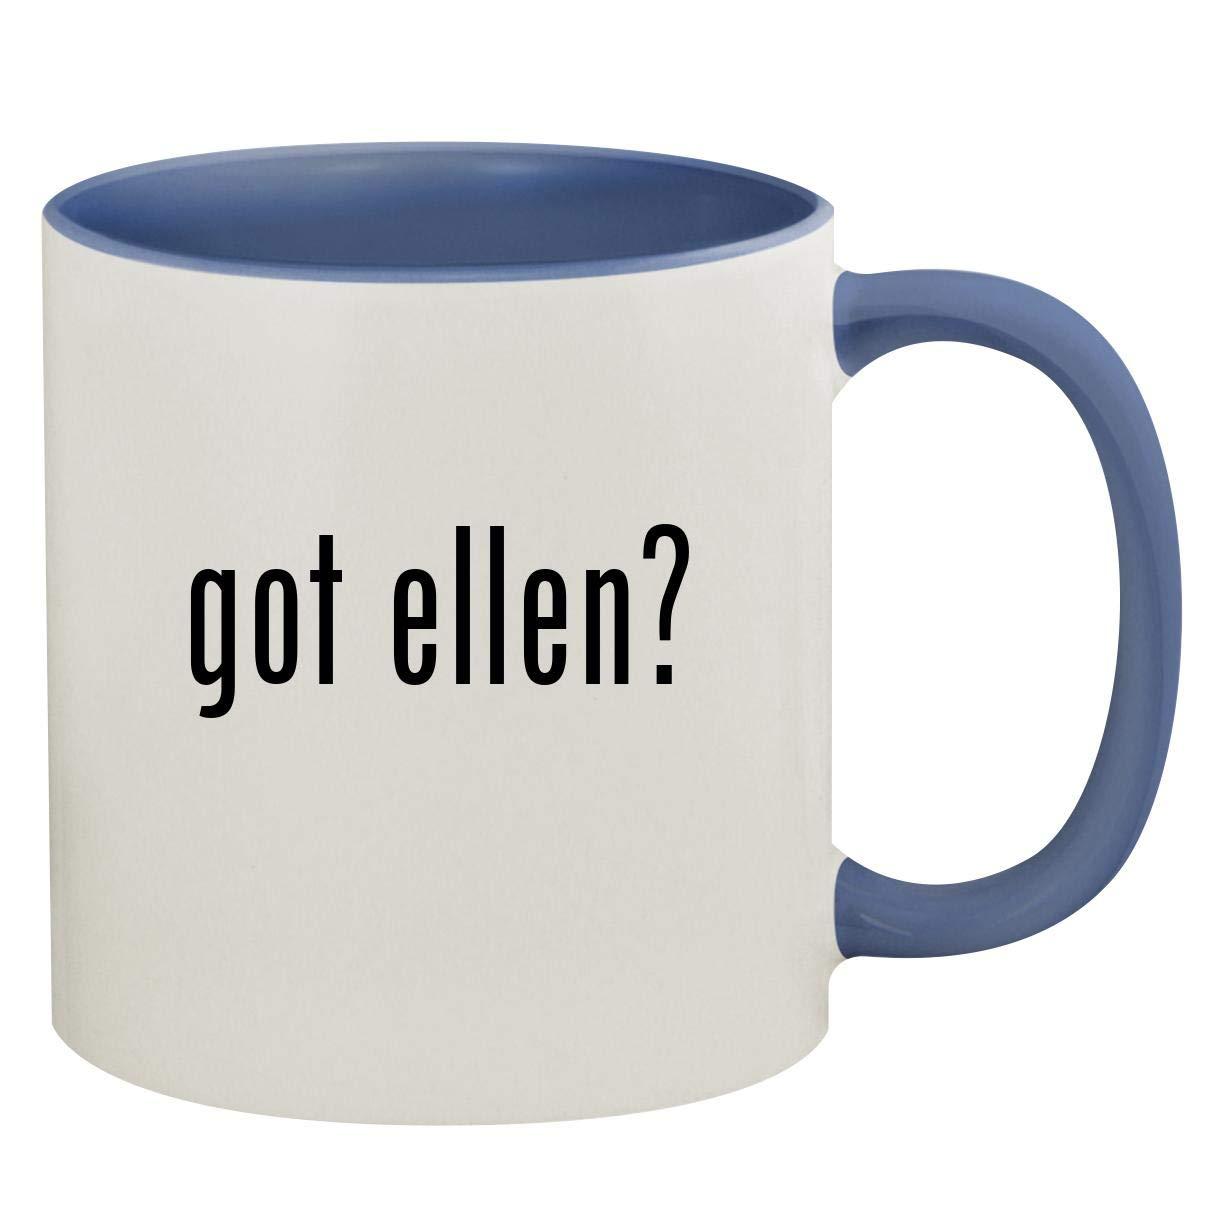 got ellen? - 11oz Ceramic Colored Inside & Handle Coffee Mug, Cambridge Blue